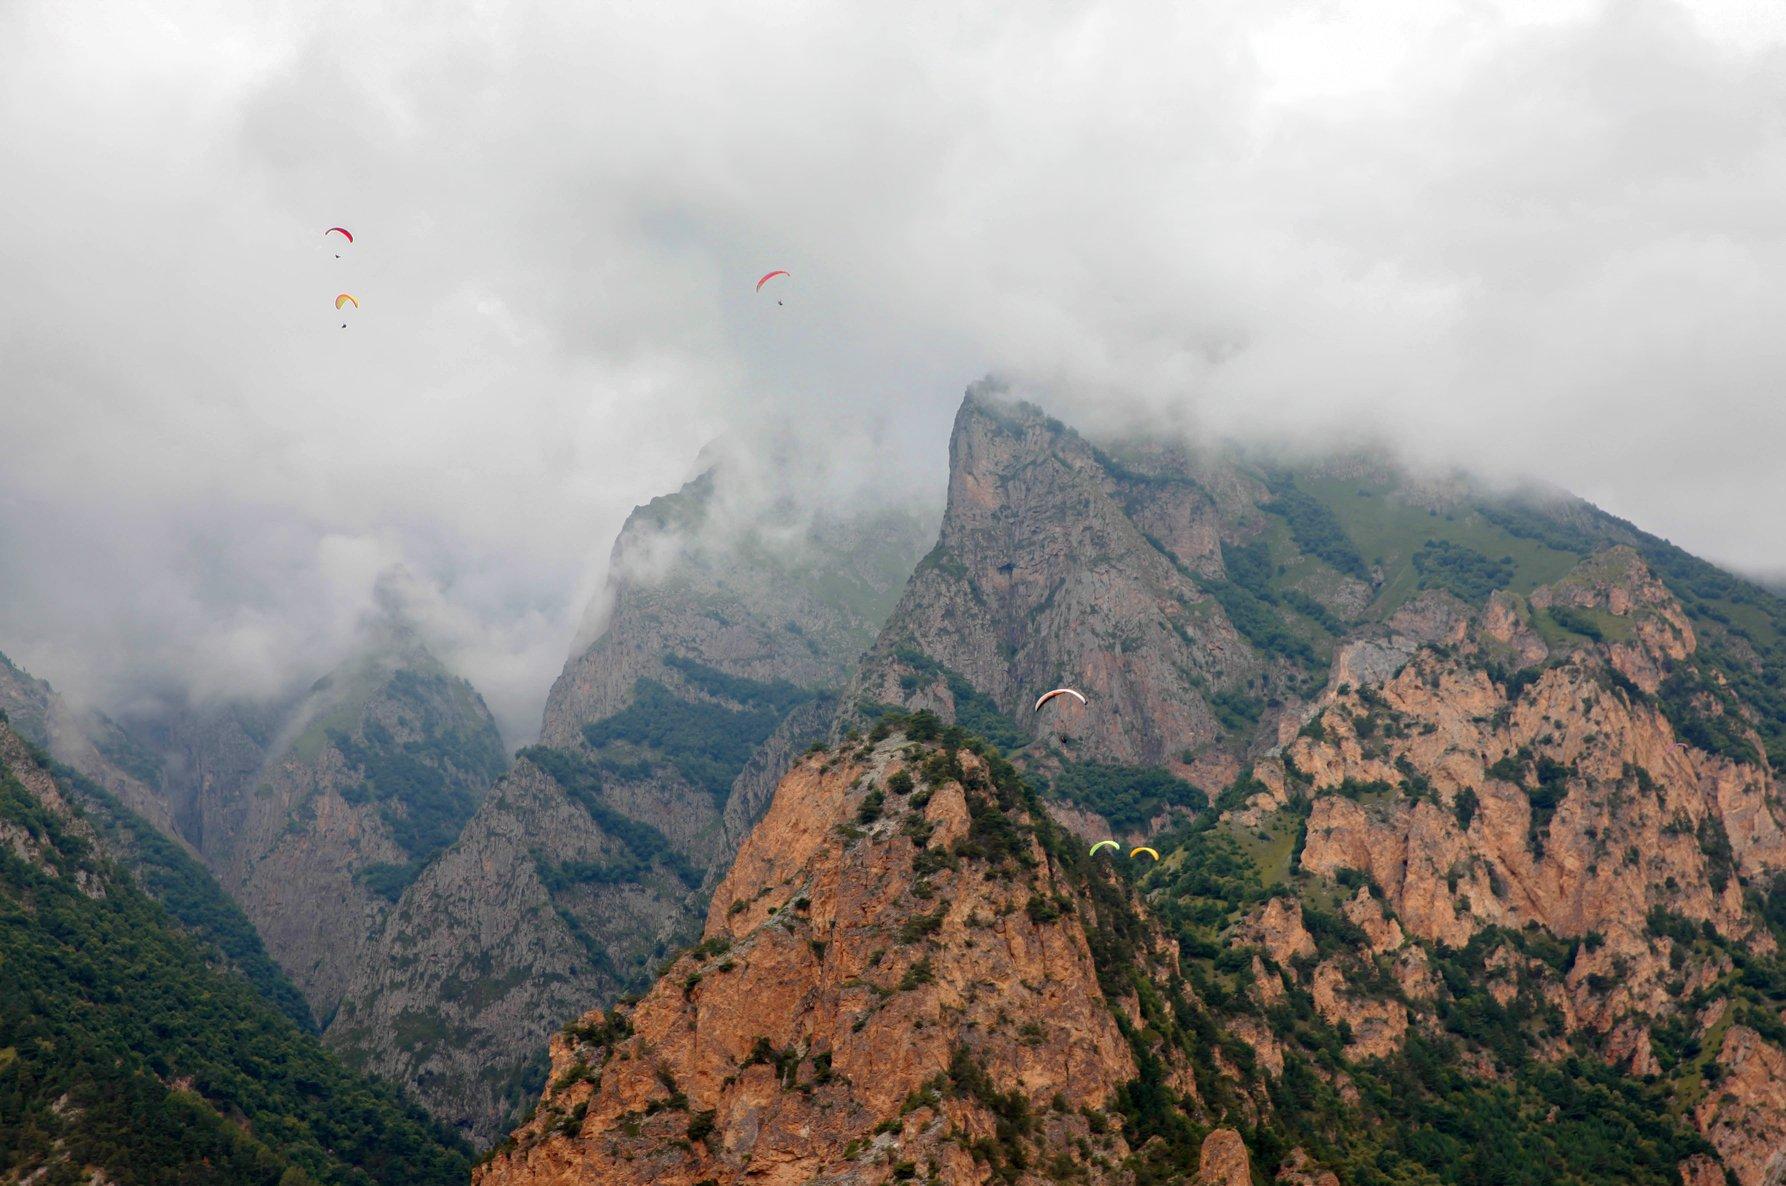 парапланеристы, чегем,природа,горы,ущелье,кабардино балкария,кавказ,северный кавказ, Magov Marat